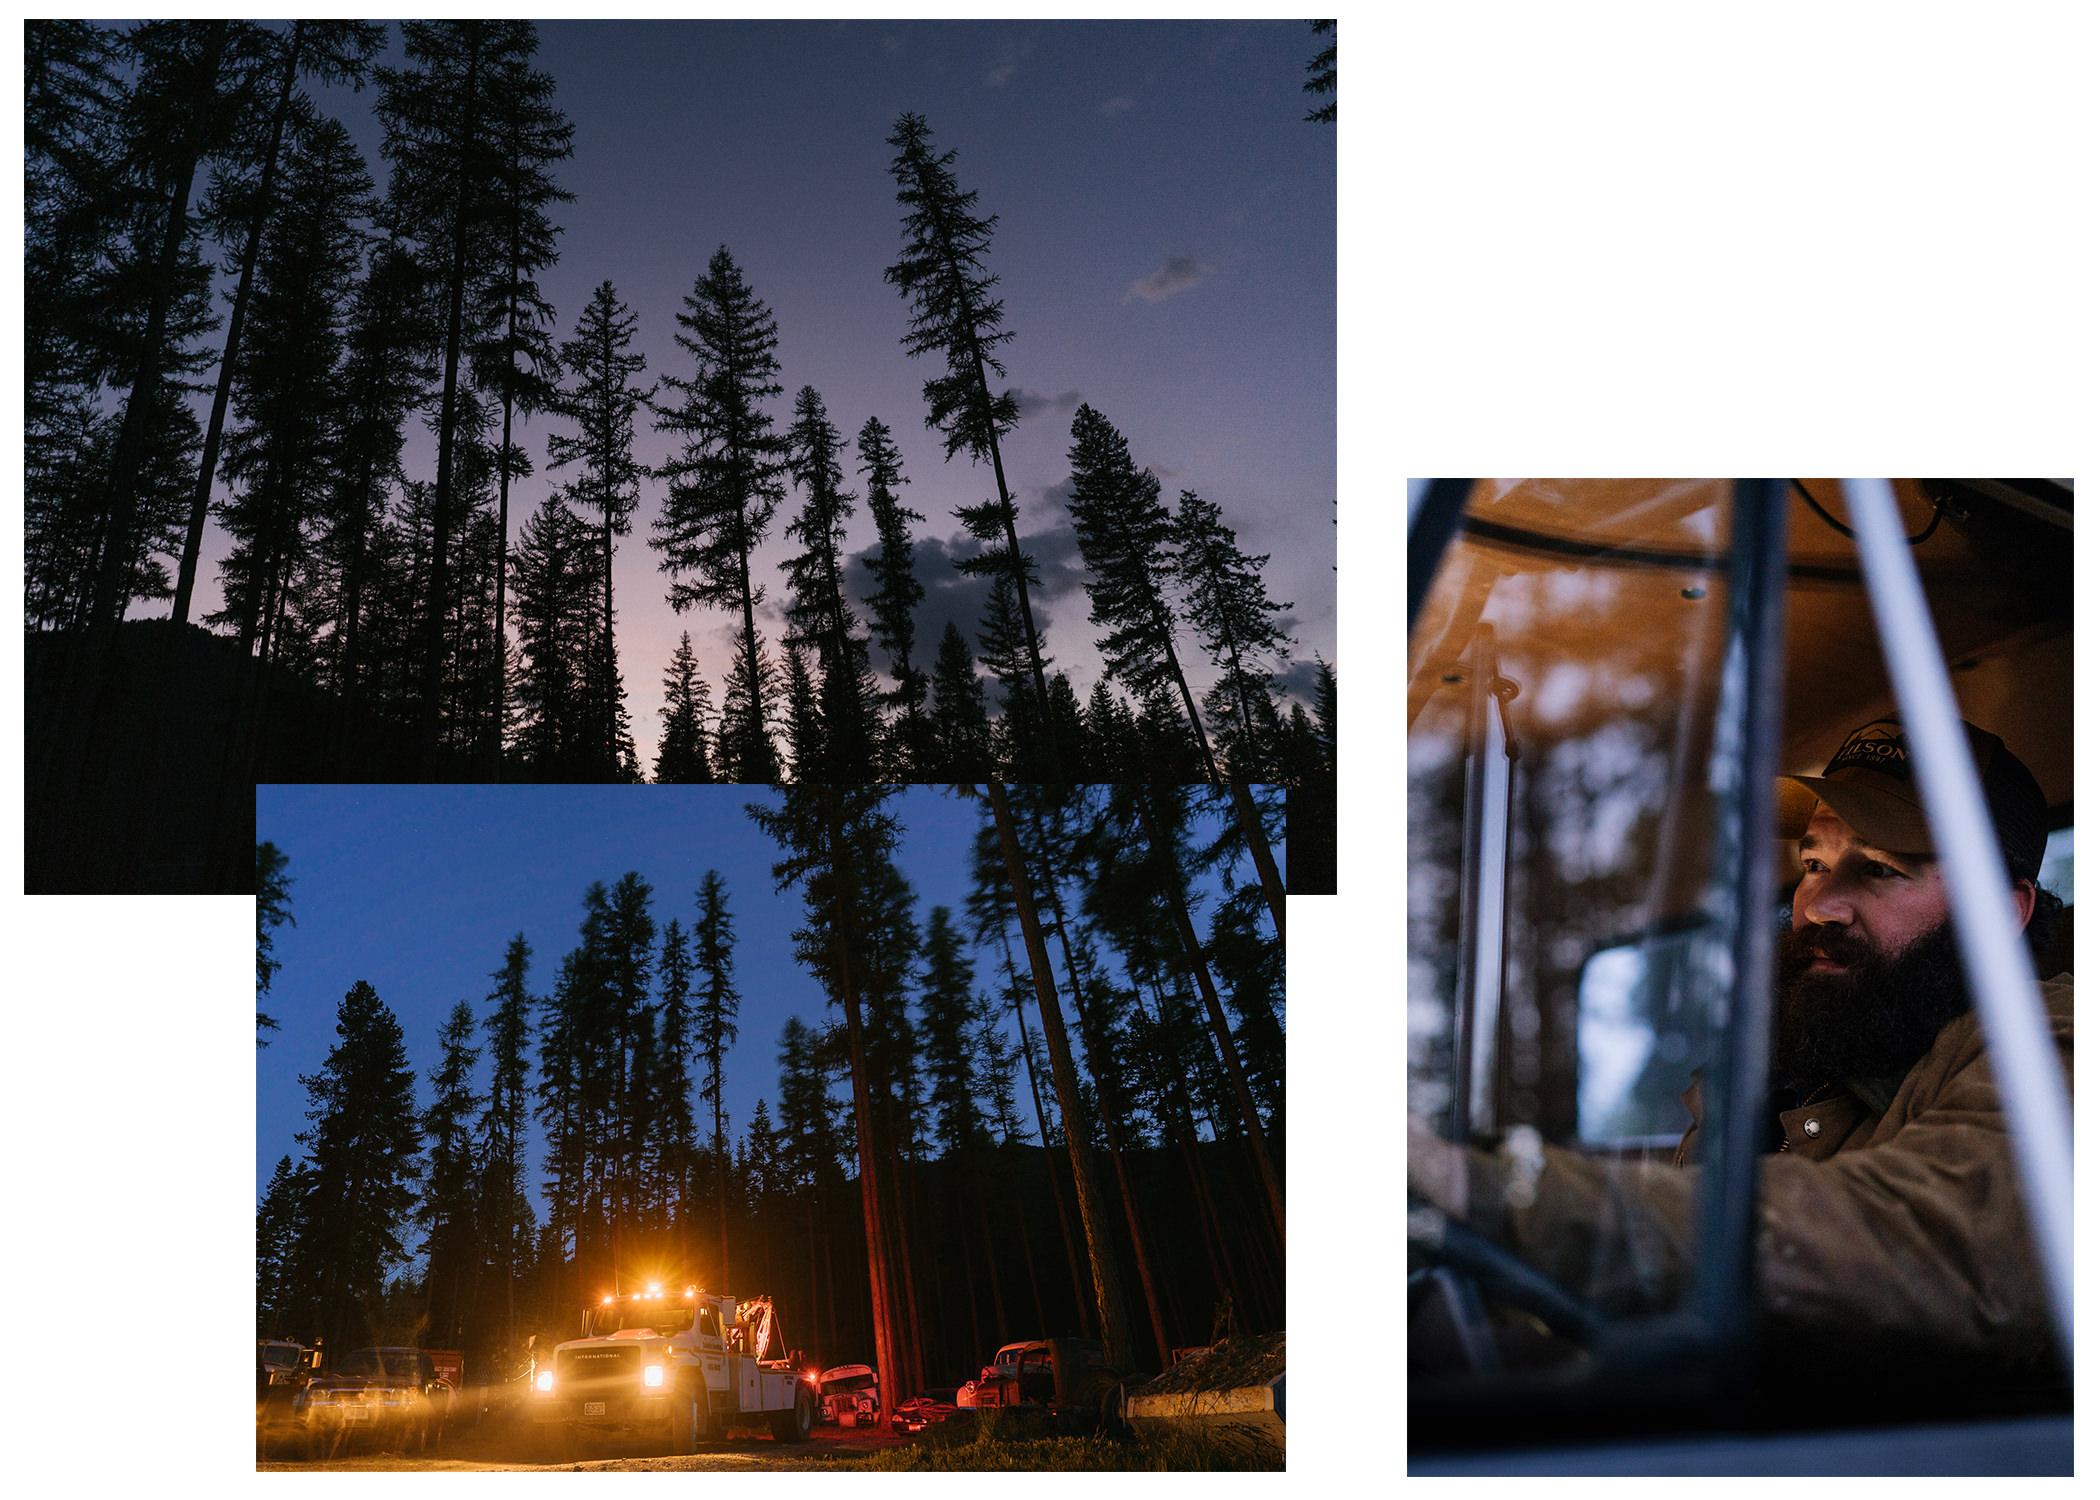 Filson_Joseph_Haeberle_Photography_Montana_Blue_Collar_lifestyle_Photography.jpg